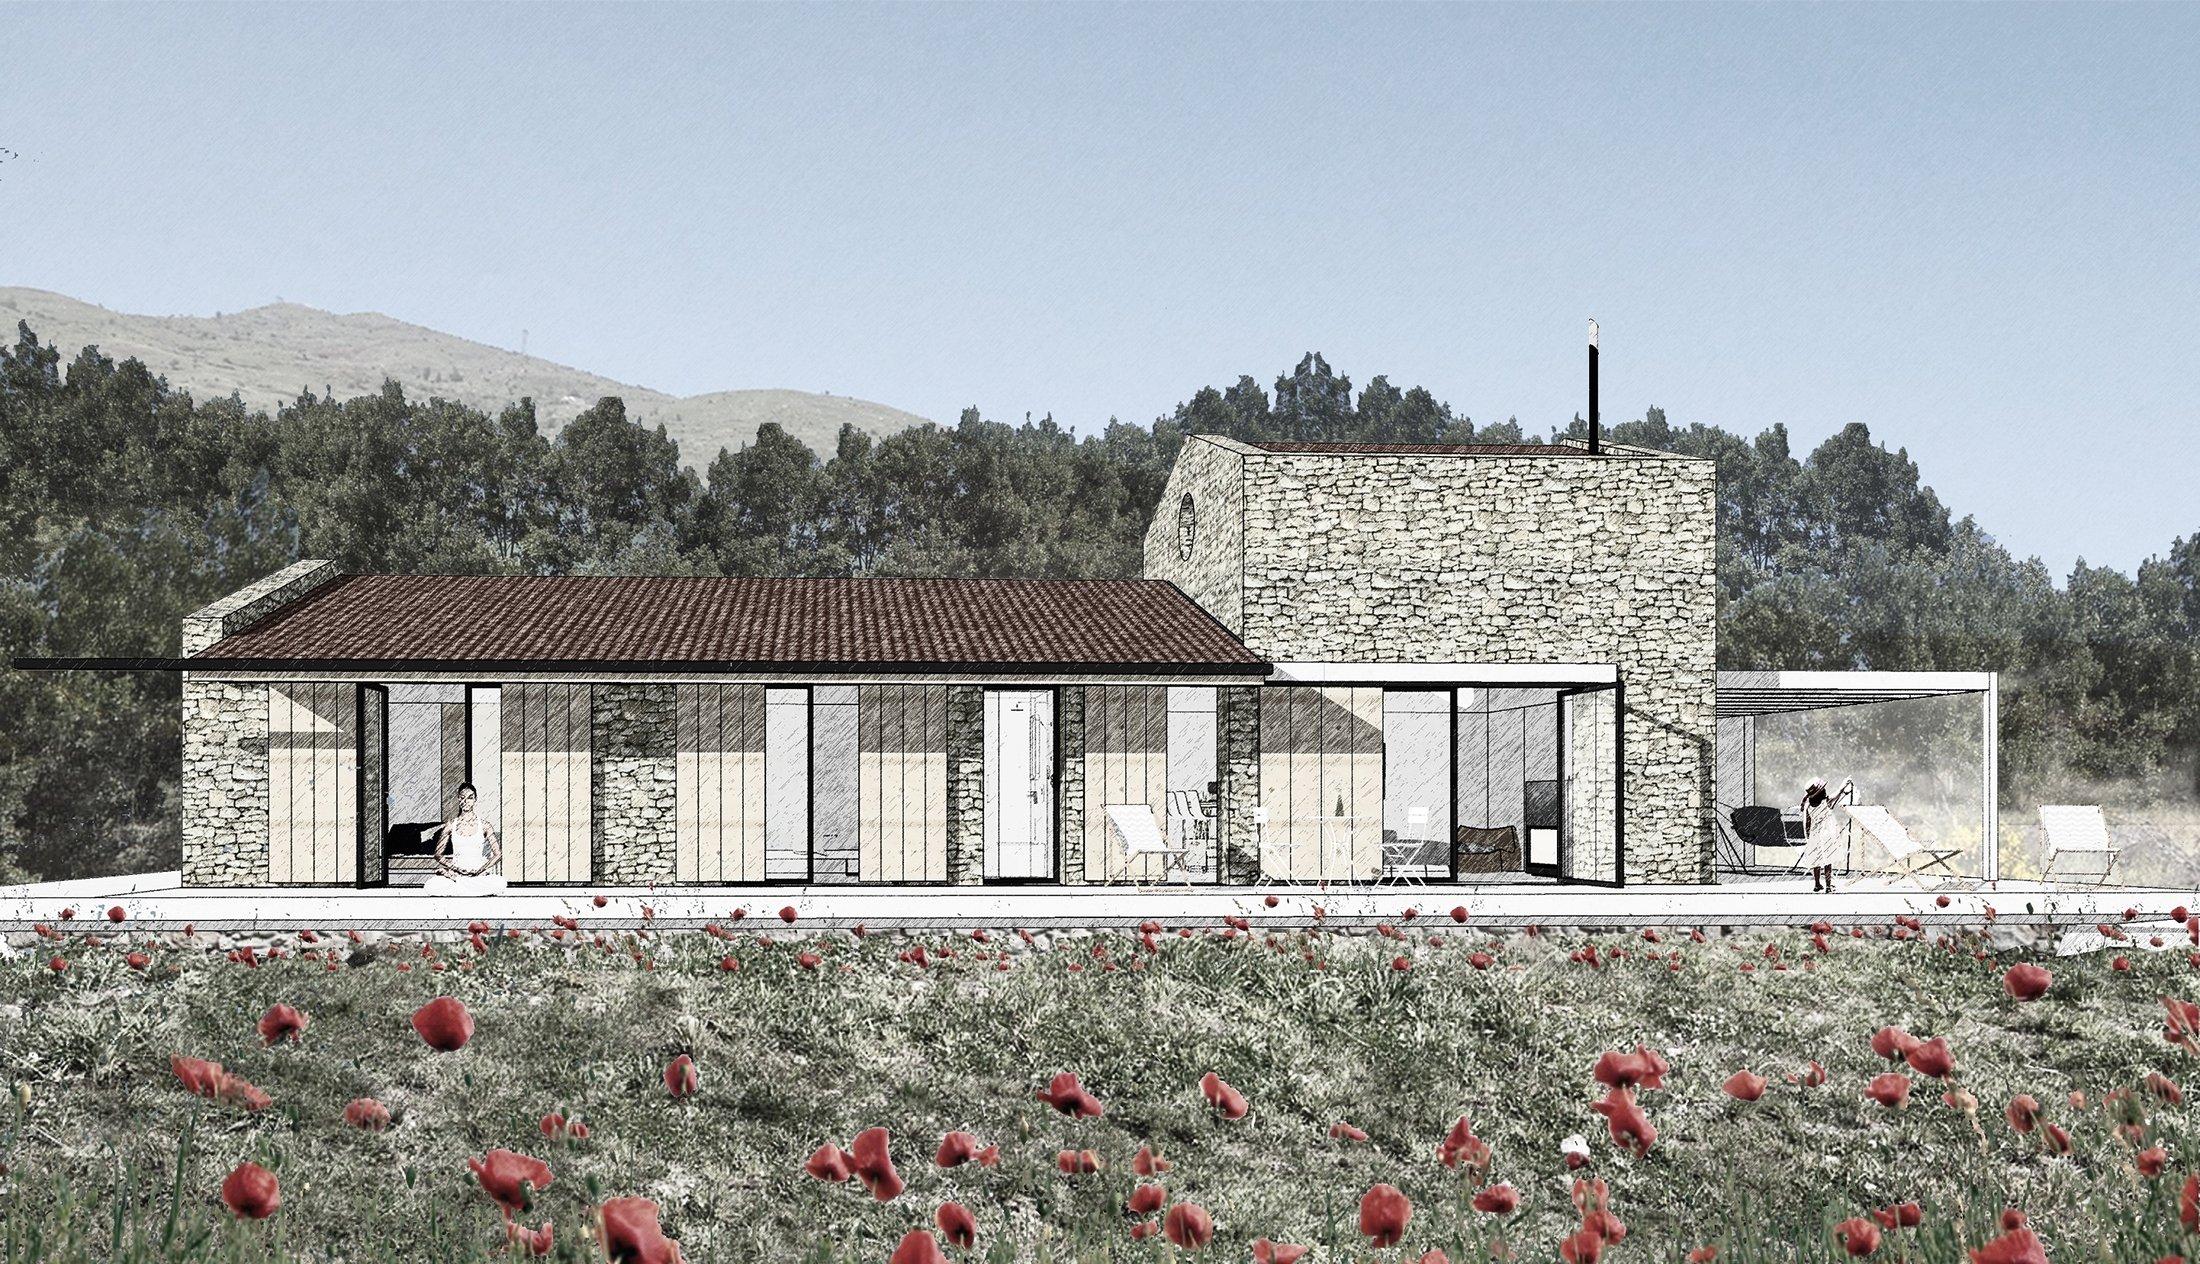 All houses have been designed to be detached at Nefes Assos. (Photo courtesy of Önder Halisdemir/Nefes Assos)